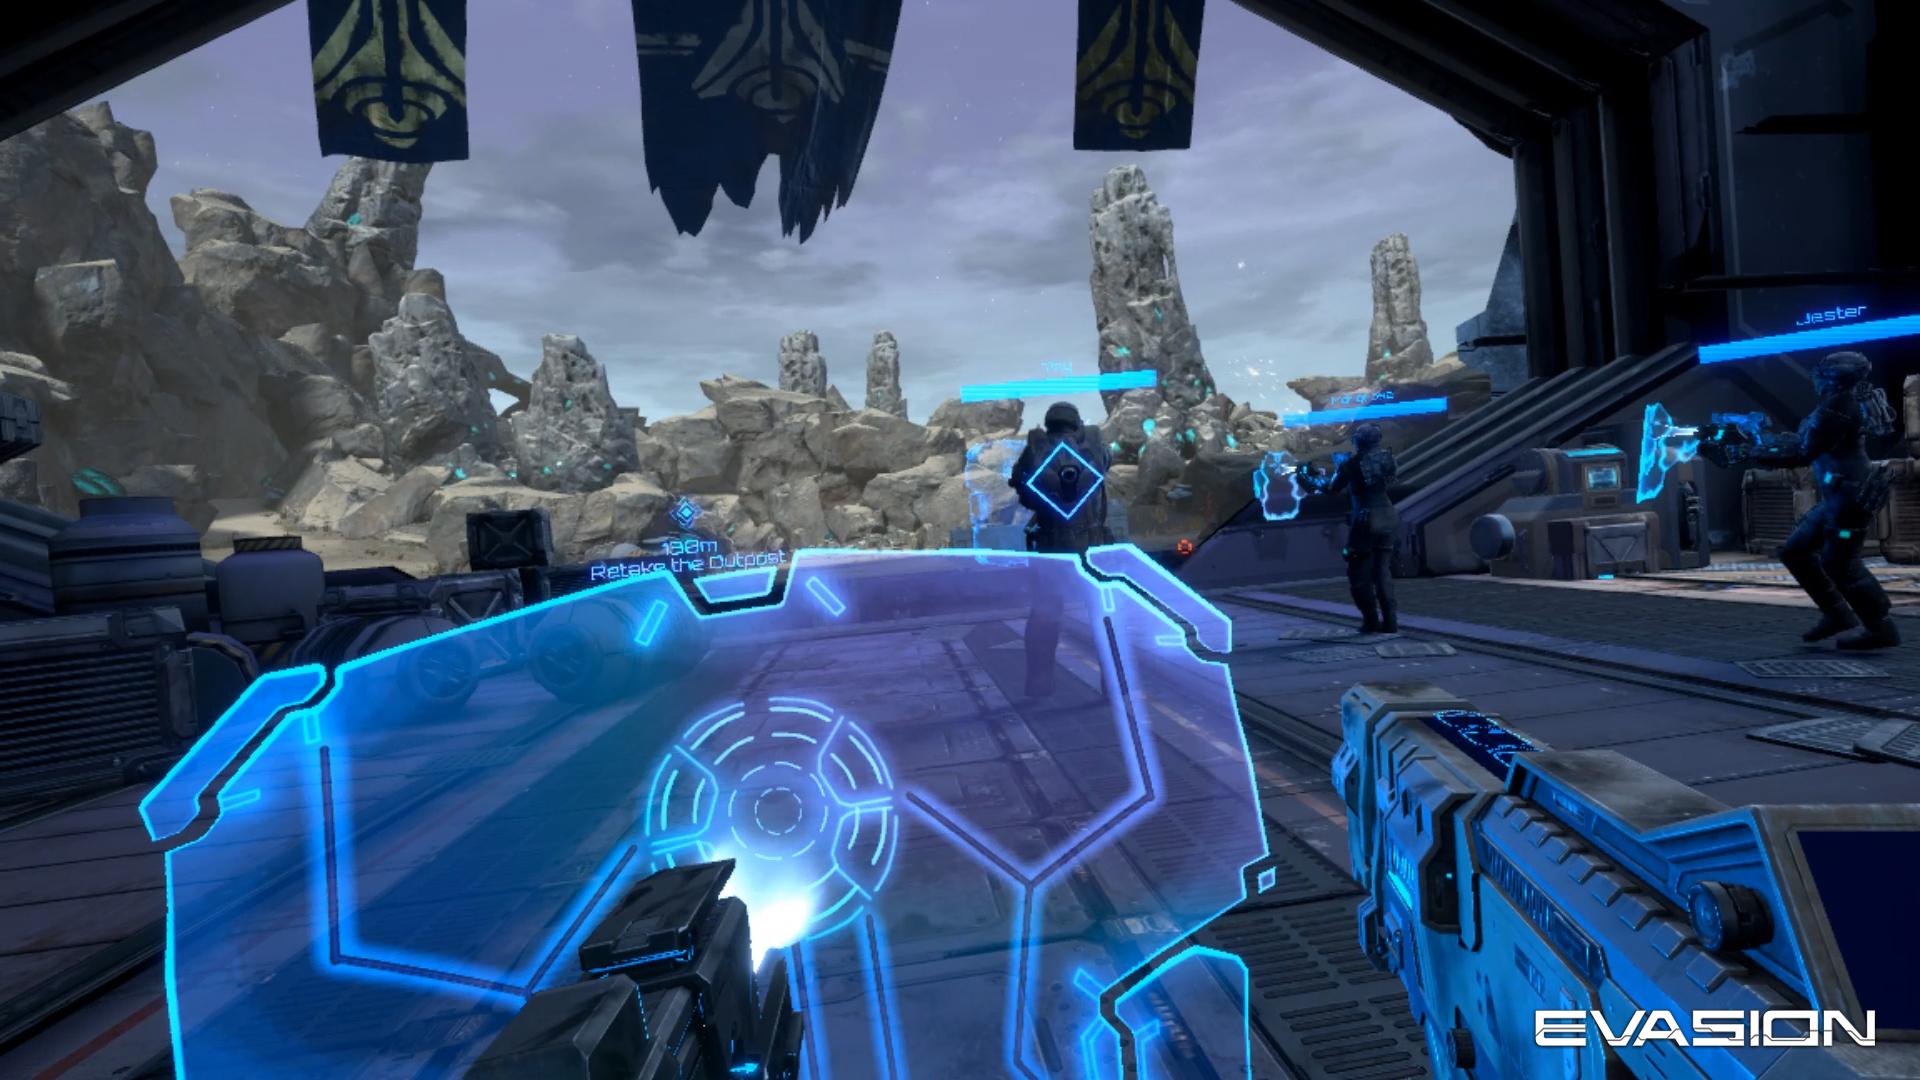 Evasion VR Game, Archiact